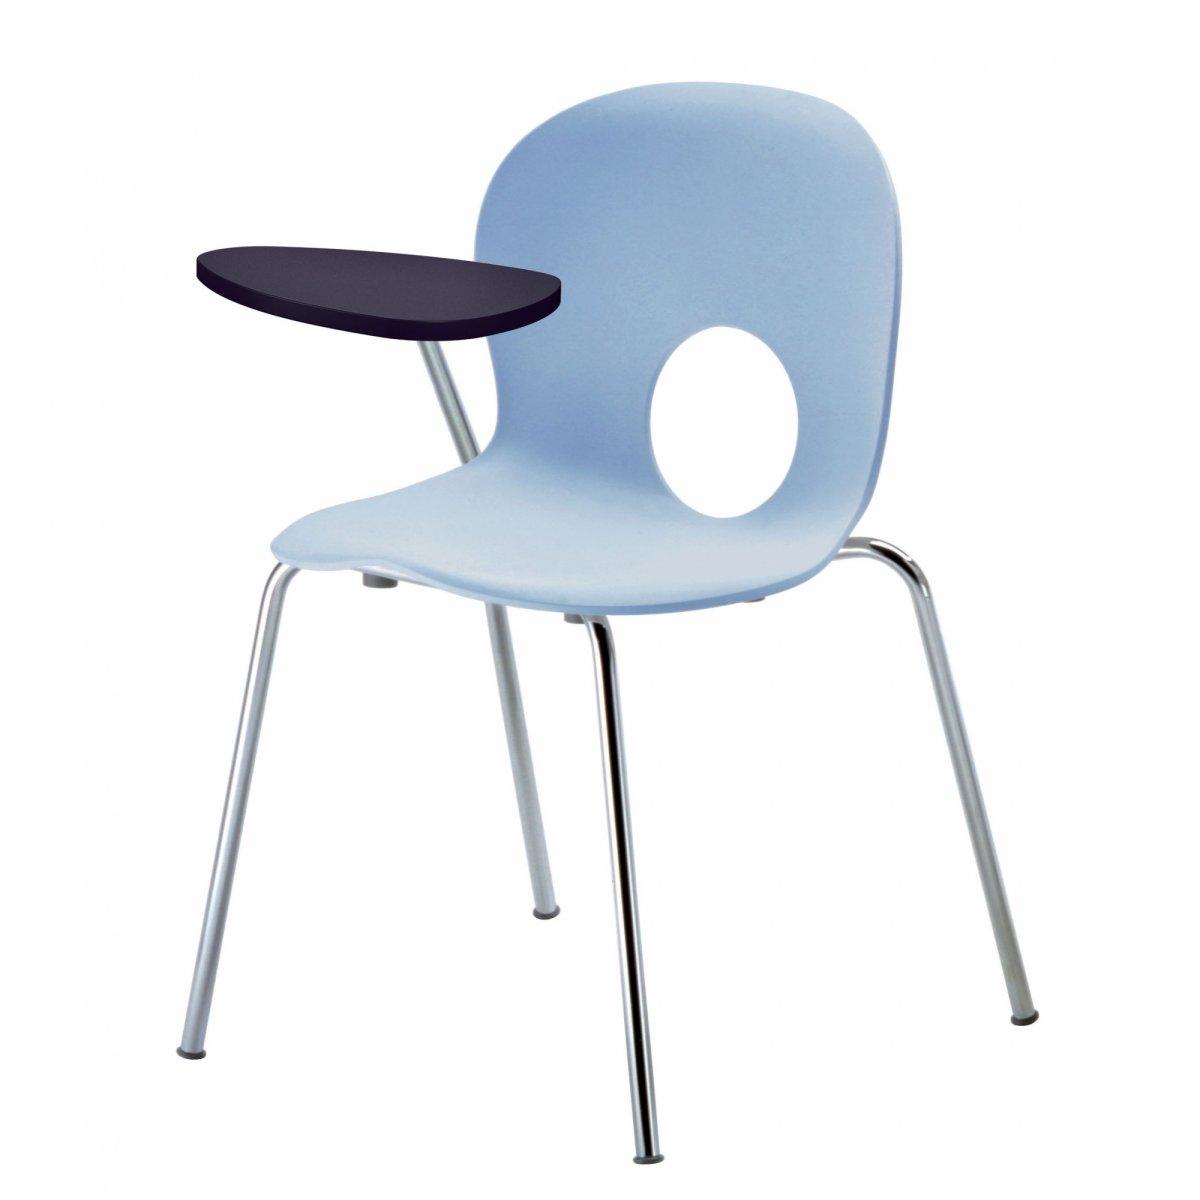 Rexite: SEDIA OLIVIA SCRITTOIO Rexite | tavoli e sedie - sedie